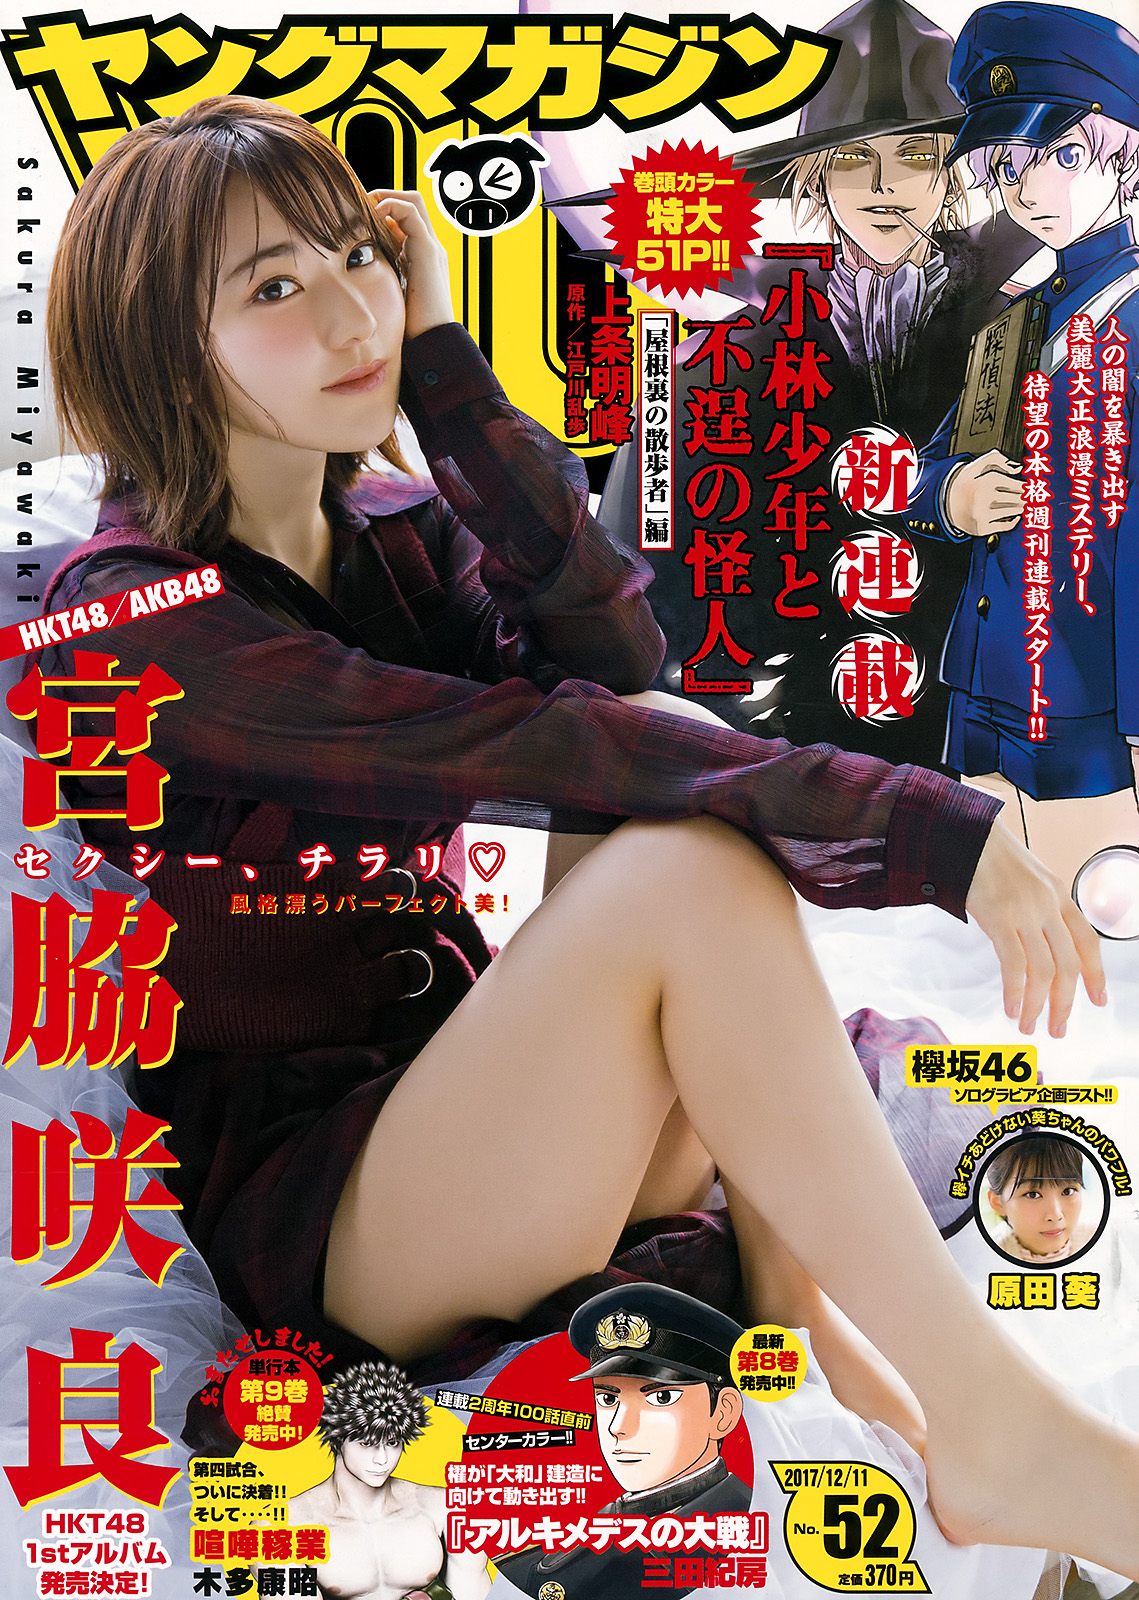 Miyawaki Sakura 宮脇咲良, Young Magazine 2017 No.52 (週刊ヤングマガジン 2017年52号)